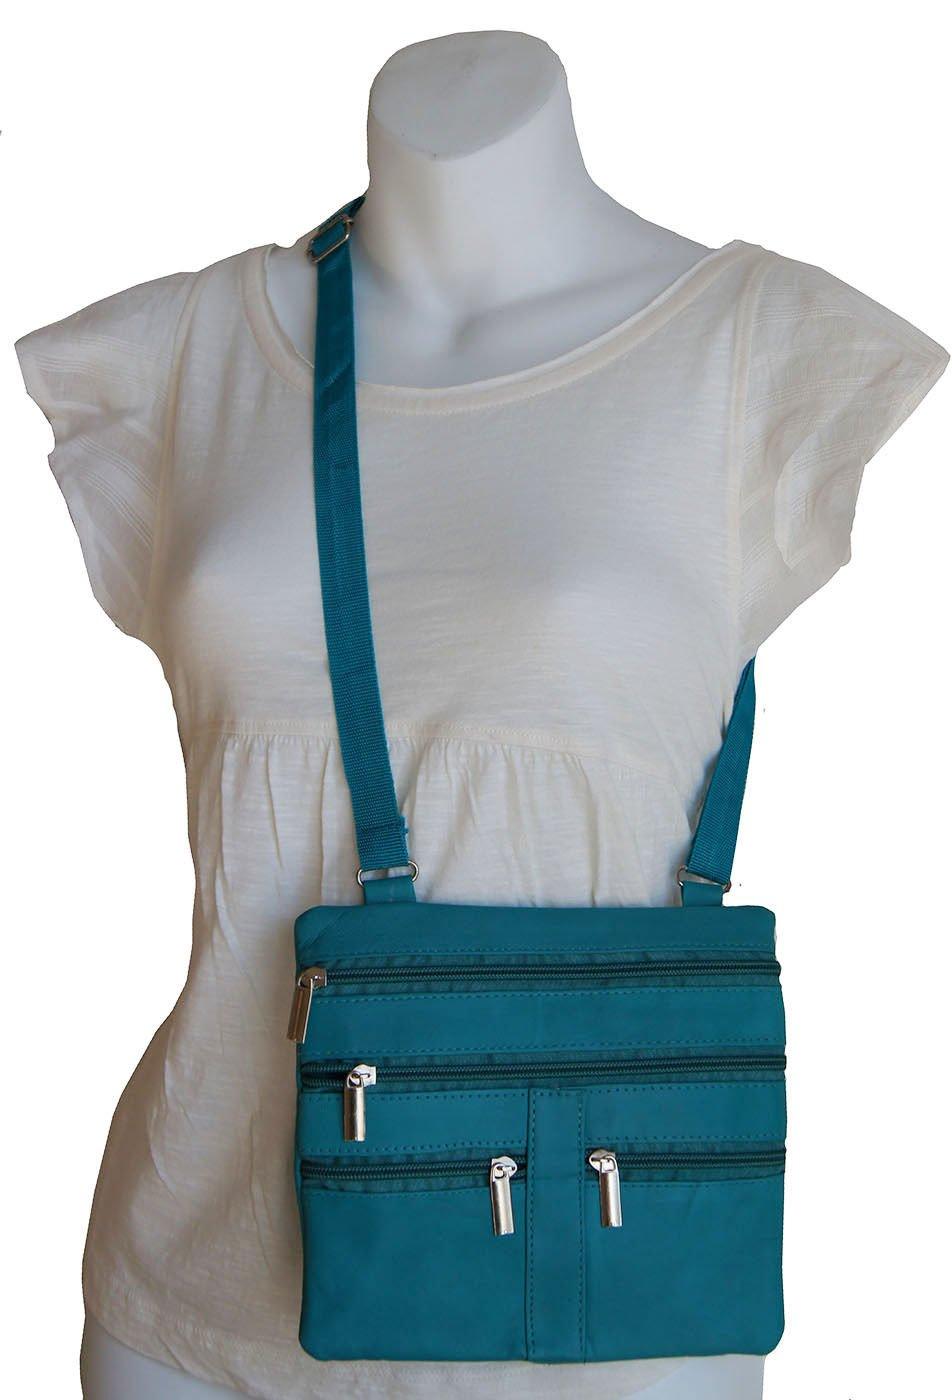 Turquoise Ladies Genuine Leather Cross Body Bag Satchel Messenger Bag 48'' Strap